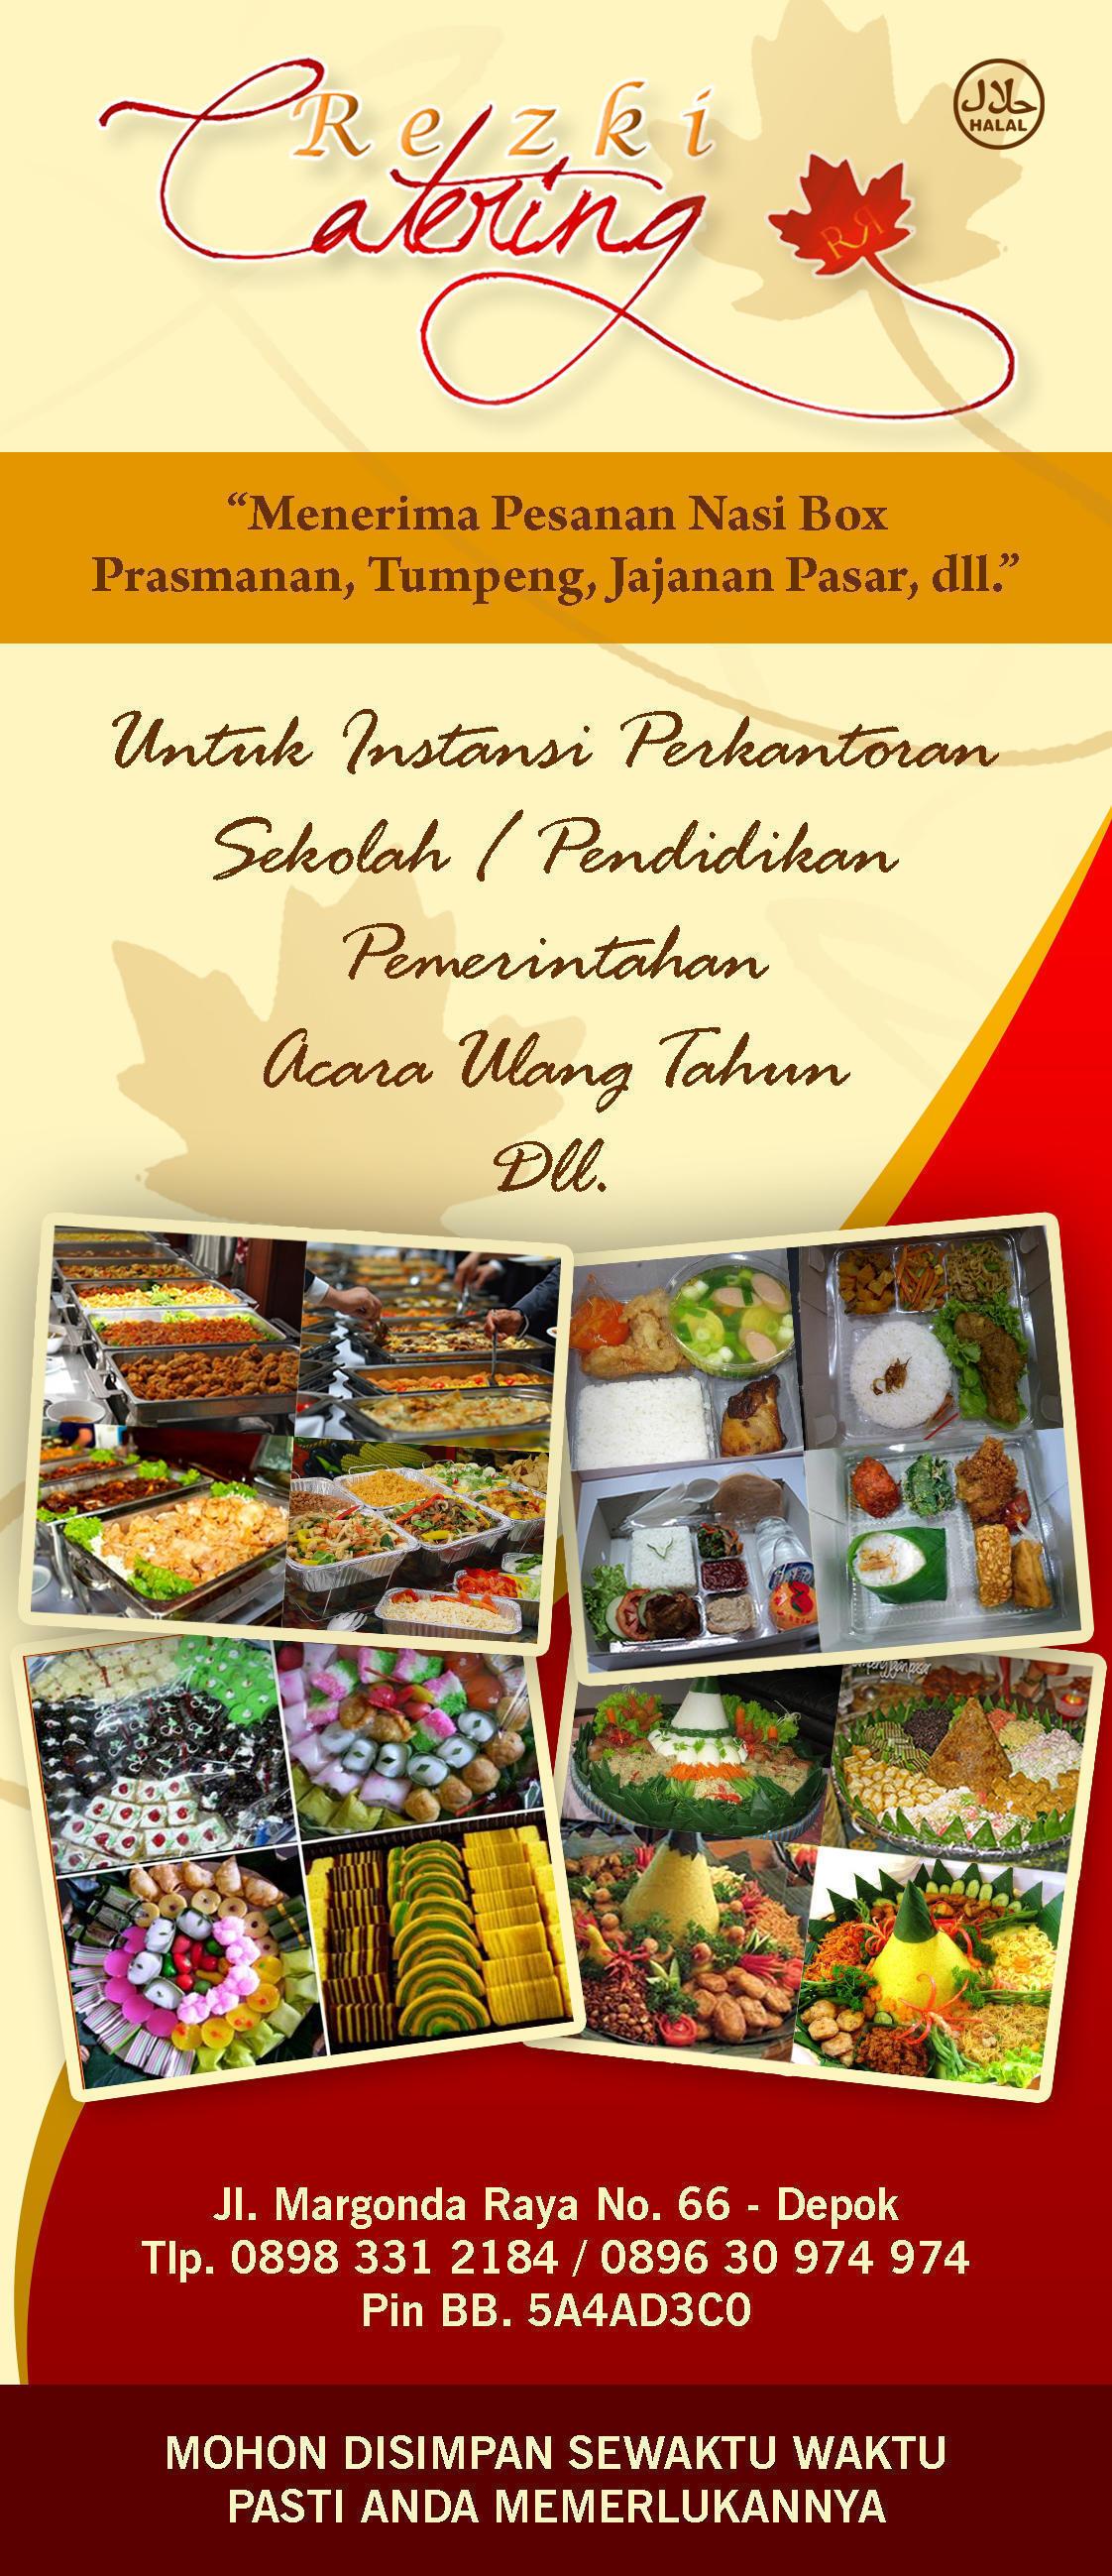 Contoh Brosur Catering : contoh, brosur, catering, Brosur, Catering, Harian, Pigura